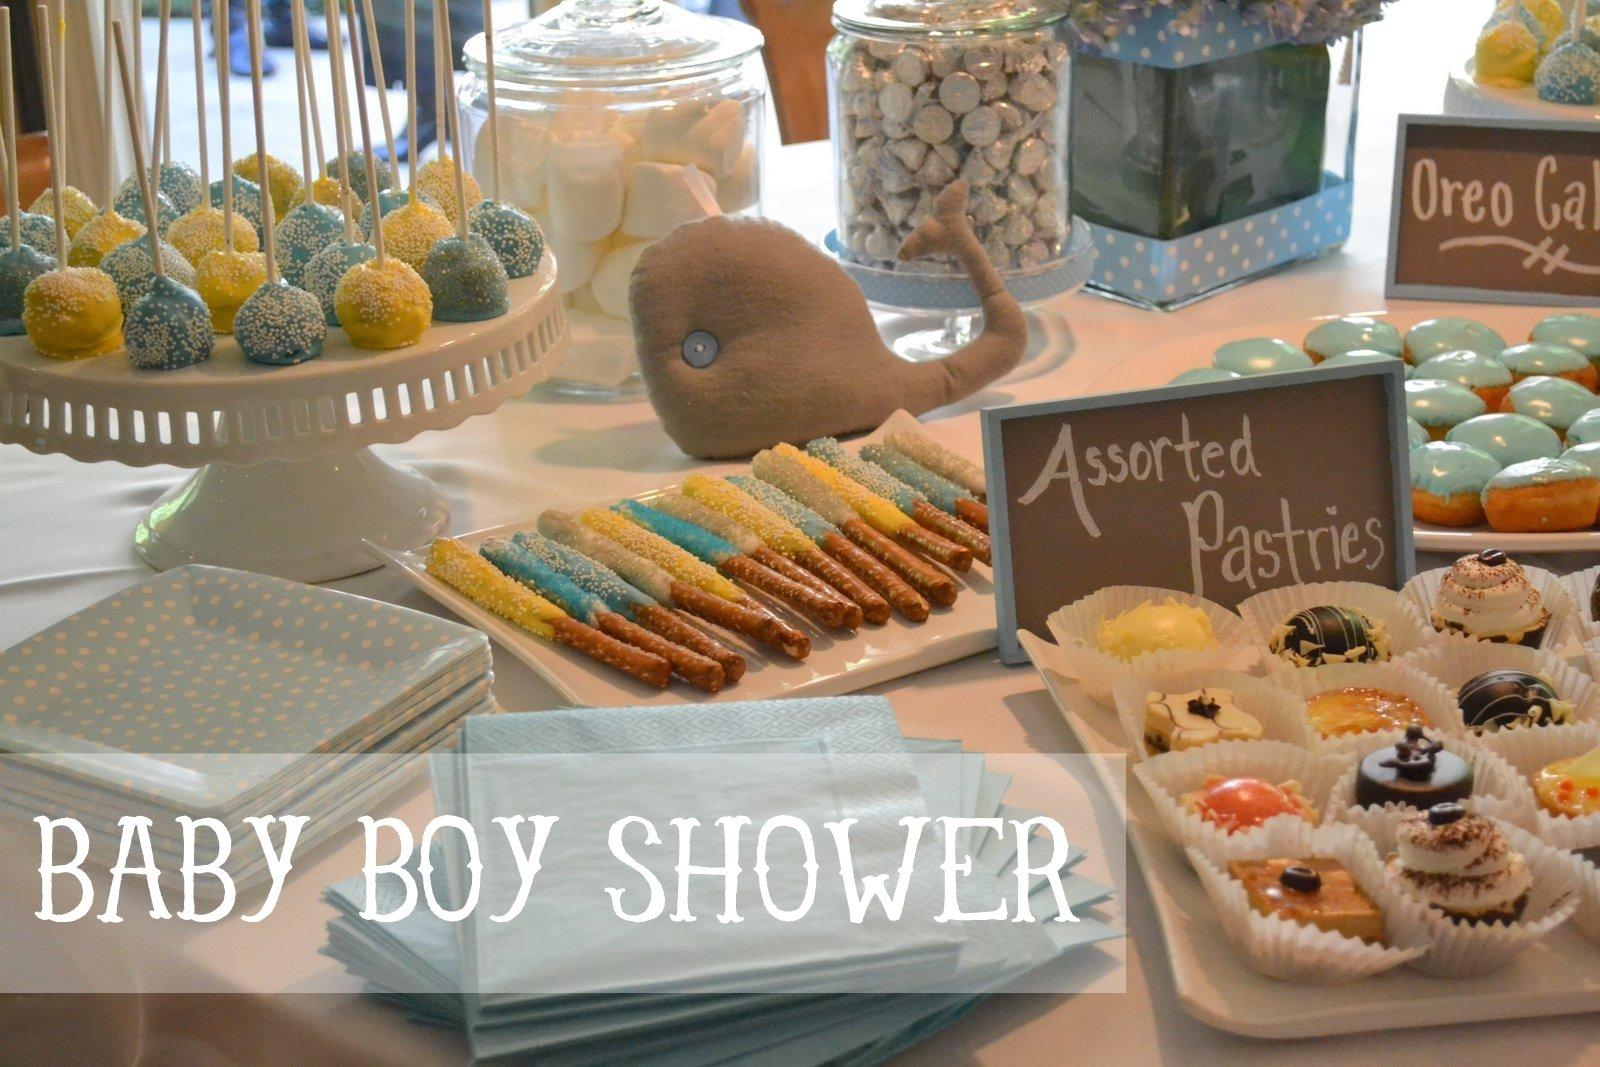 10 Stunning Baby Shower Food Ideas For Boy whale baby boy shower ideas 2 2020